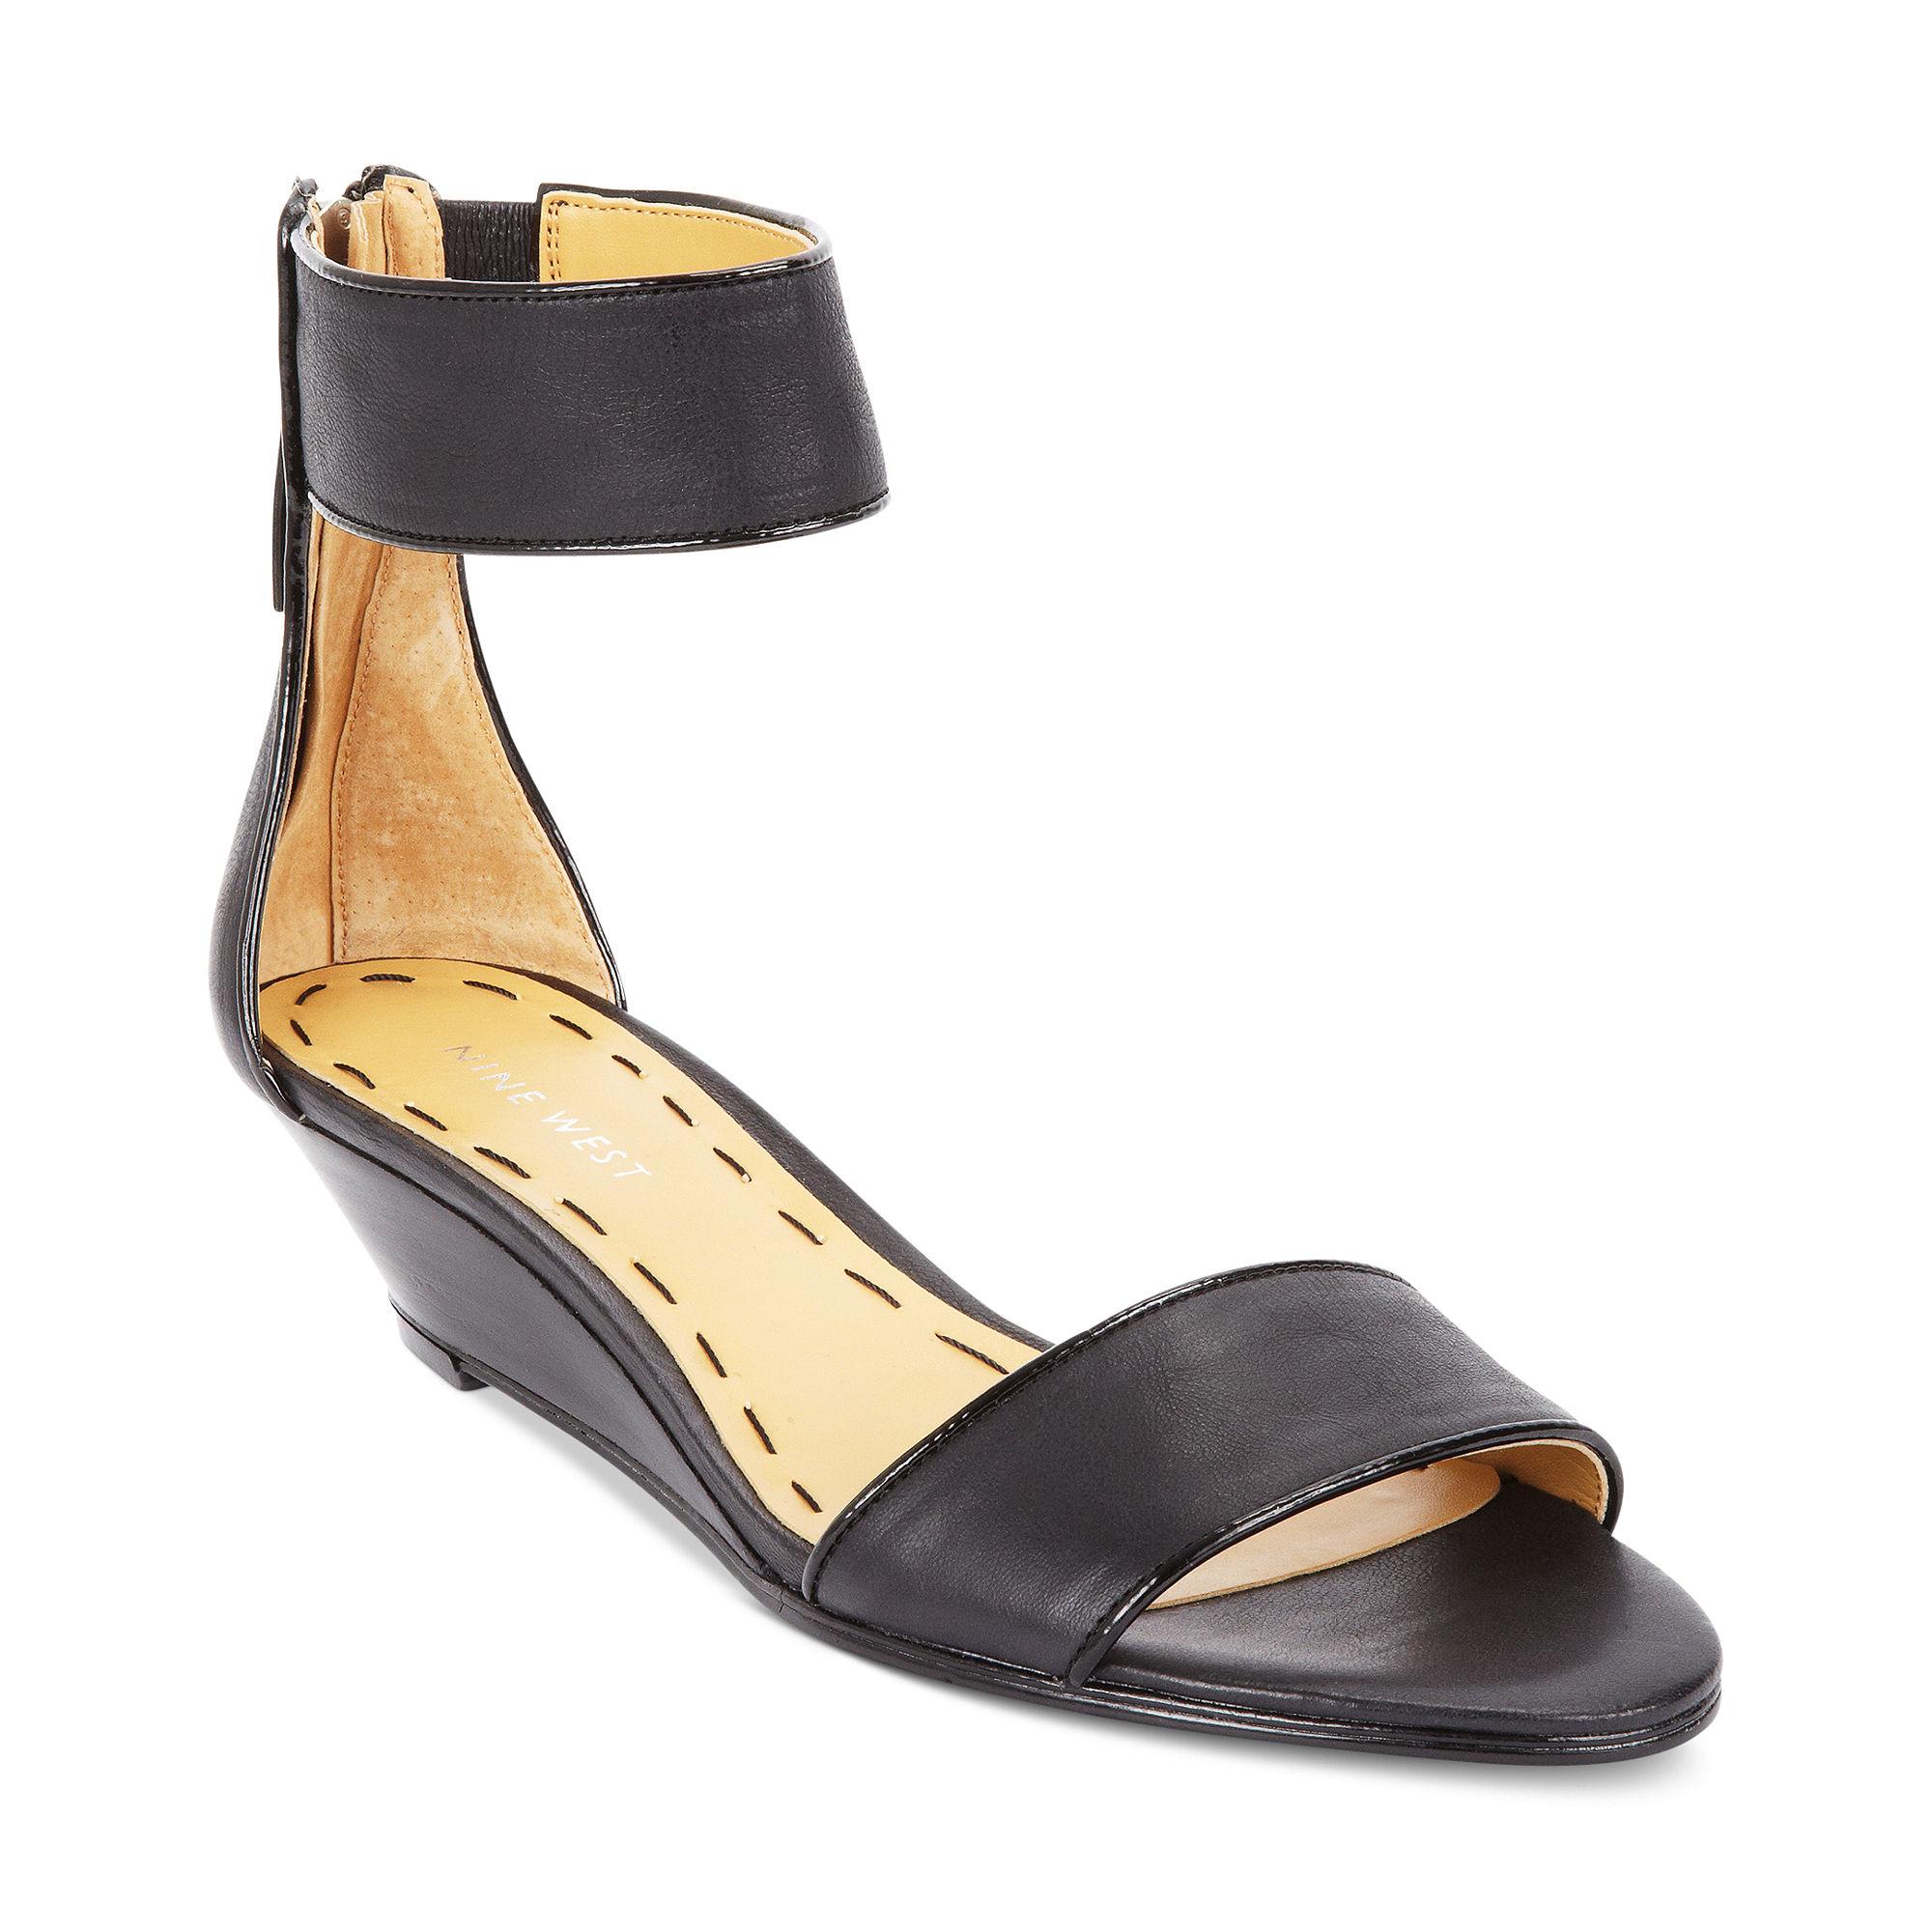 399efb6ace57 Lyst - Nine West Vilta Demi Wedge Sandals in Black